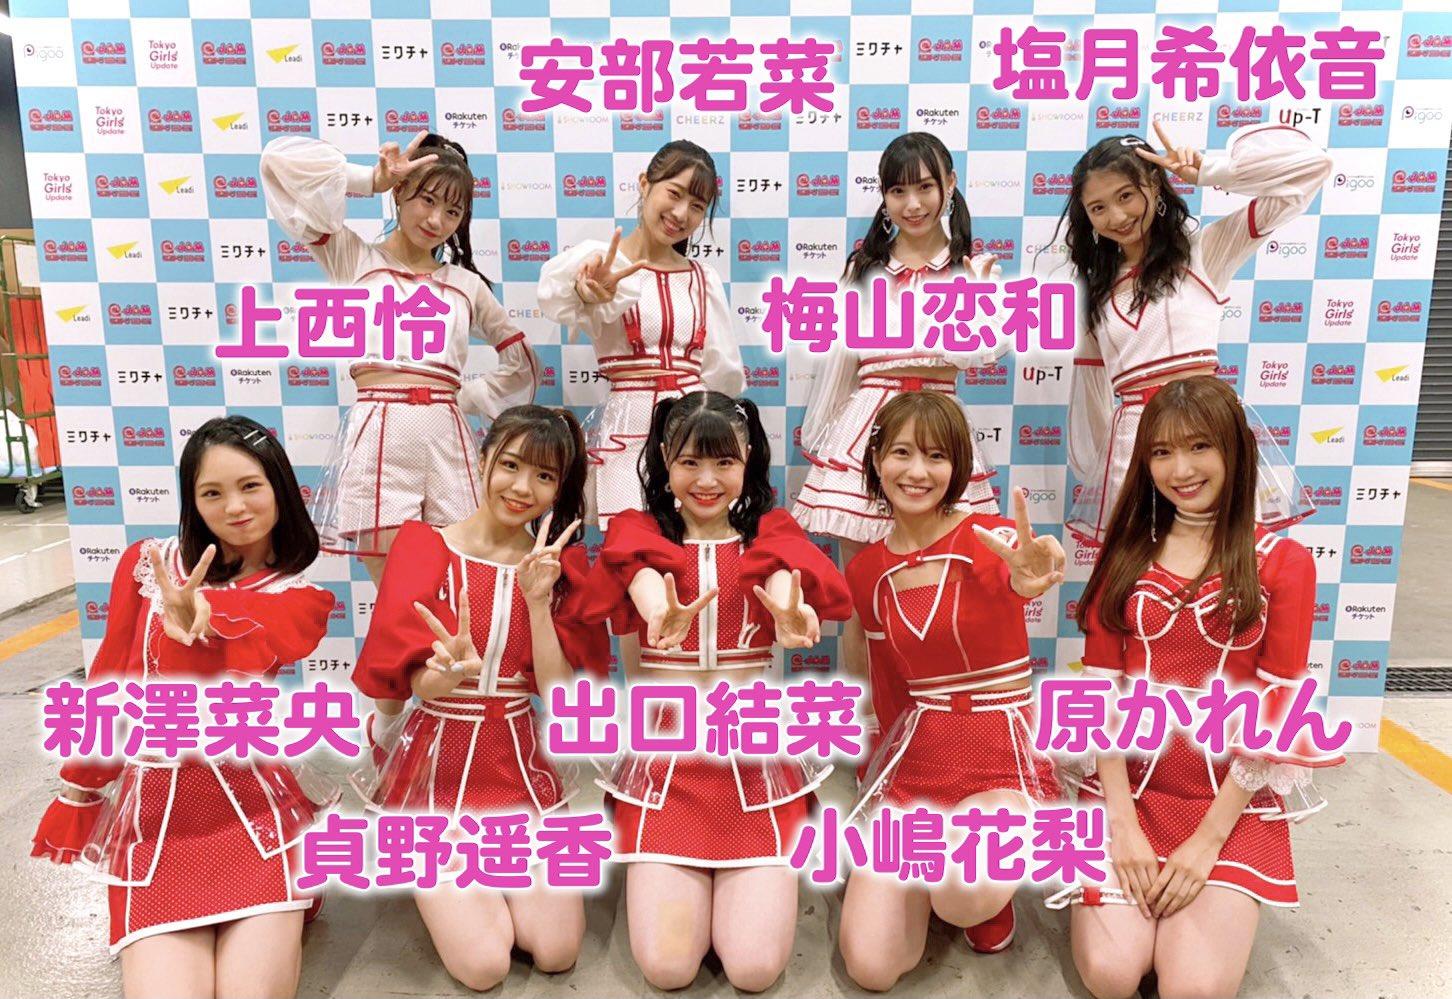 【NMB48】8月27日開催『@ JAM EXPO 2020-2021』セットリスト・関連ツイートなど